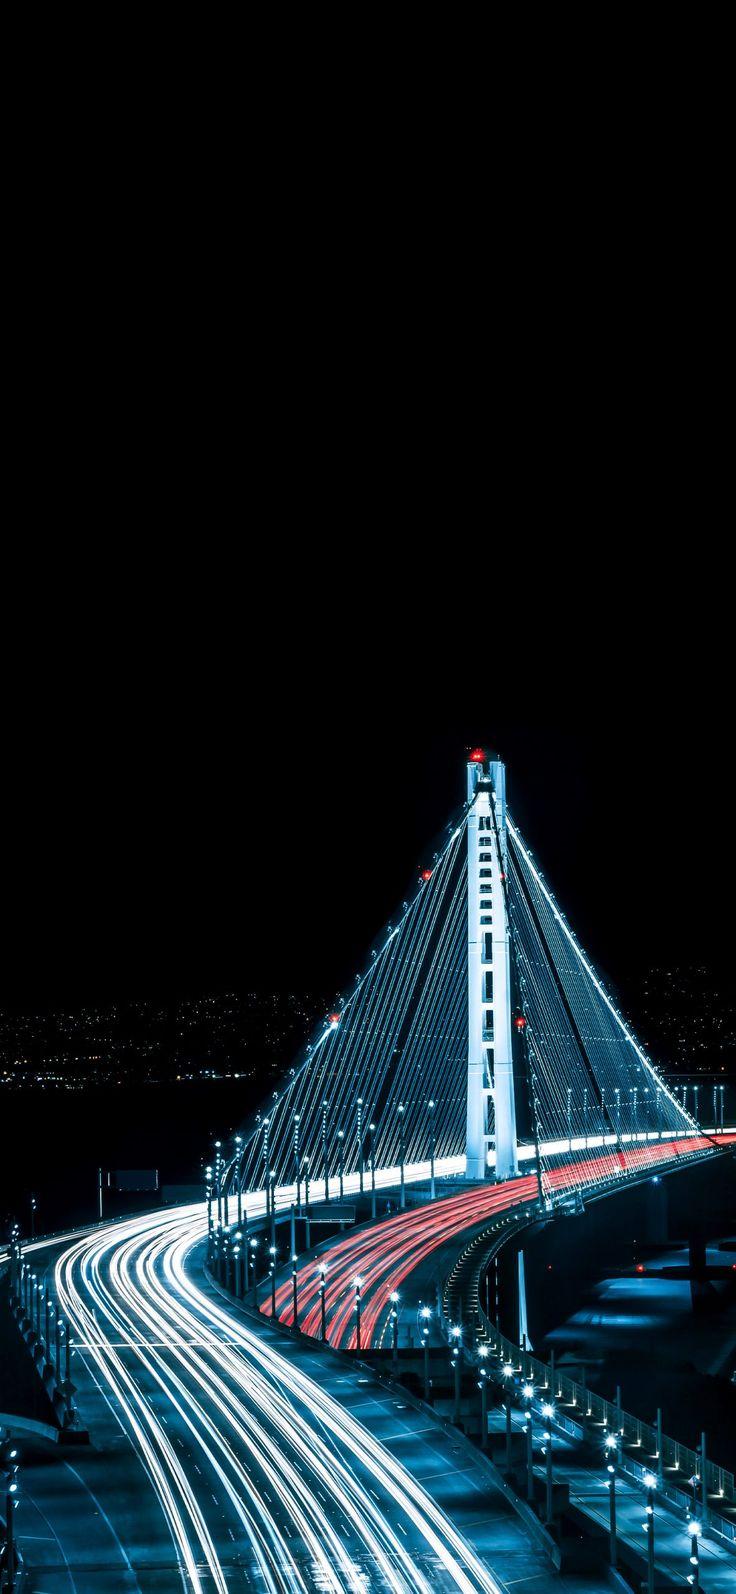 San Francisco Oakland Bay Bridge em 2020